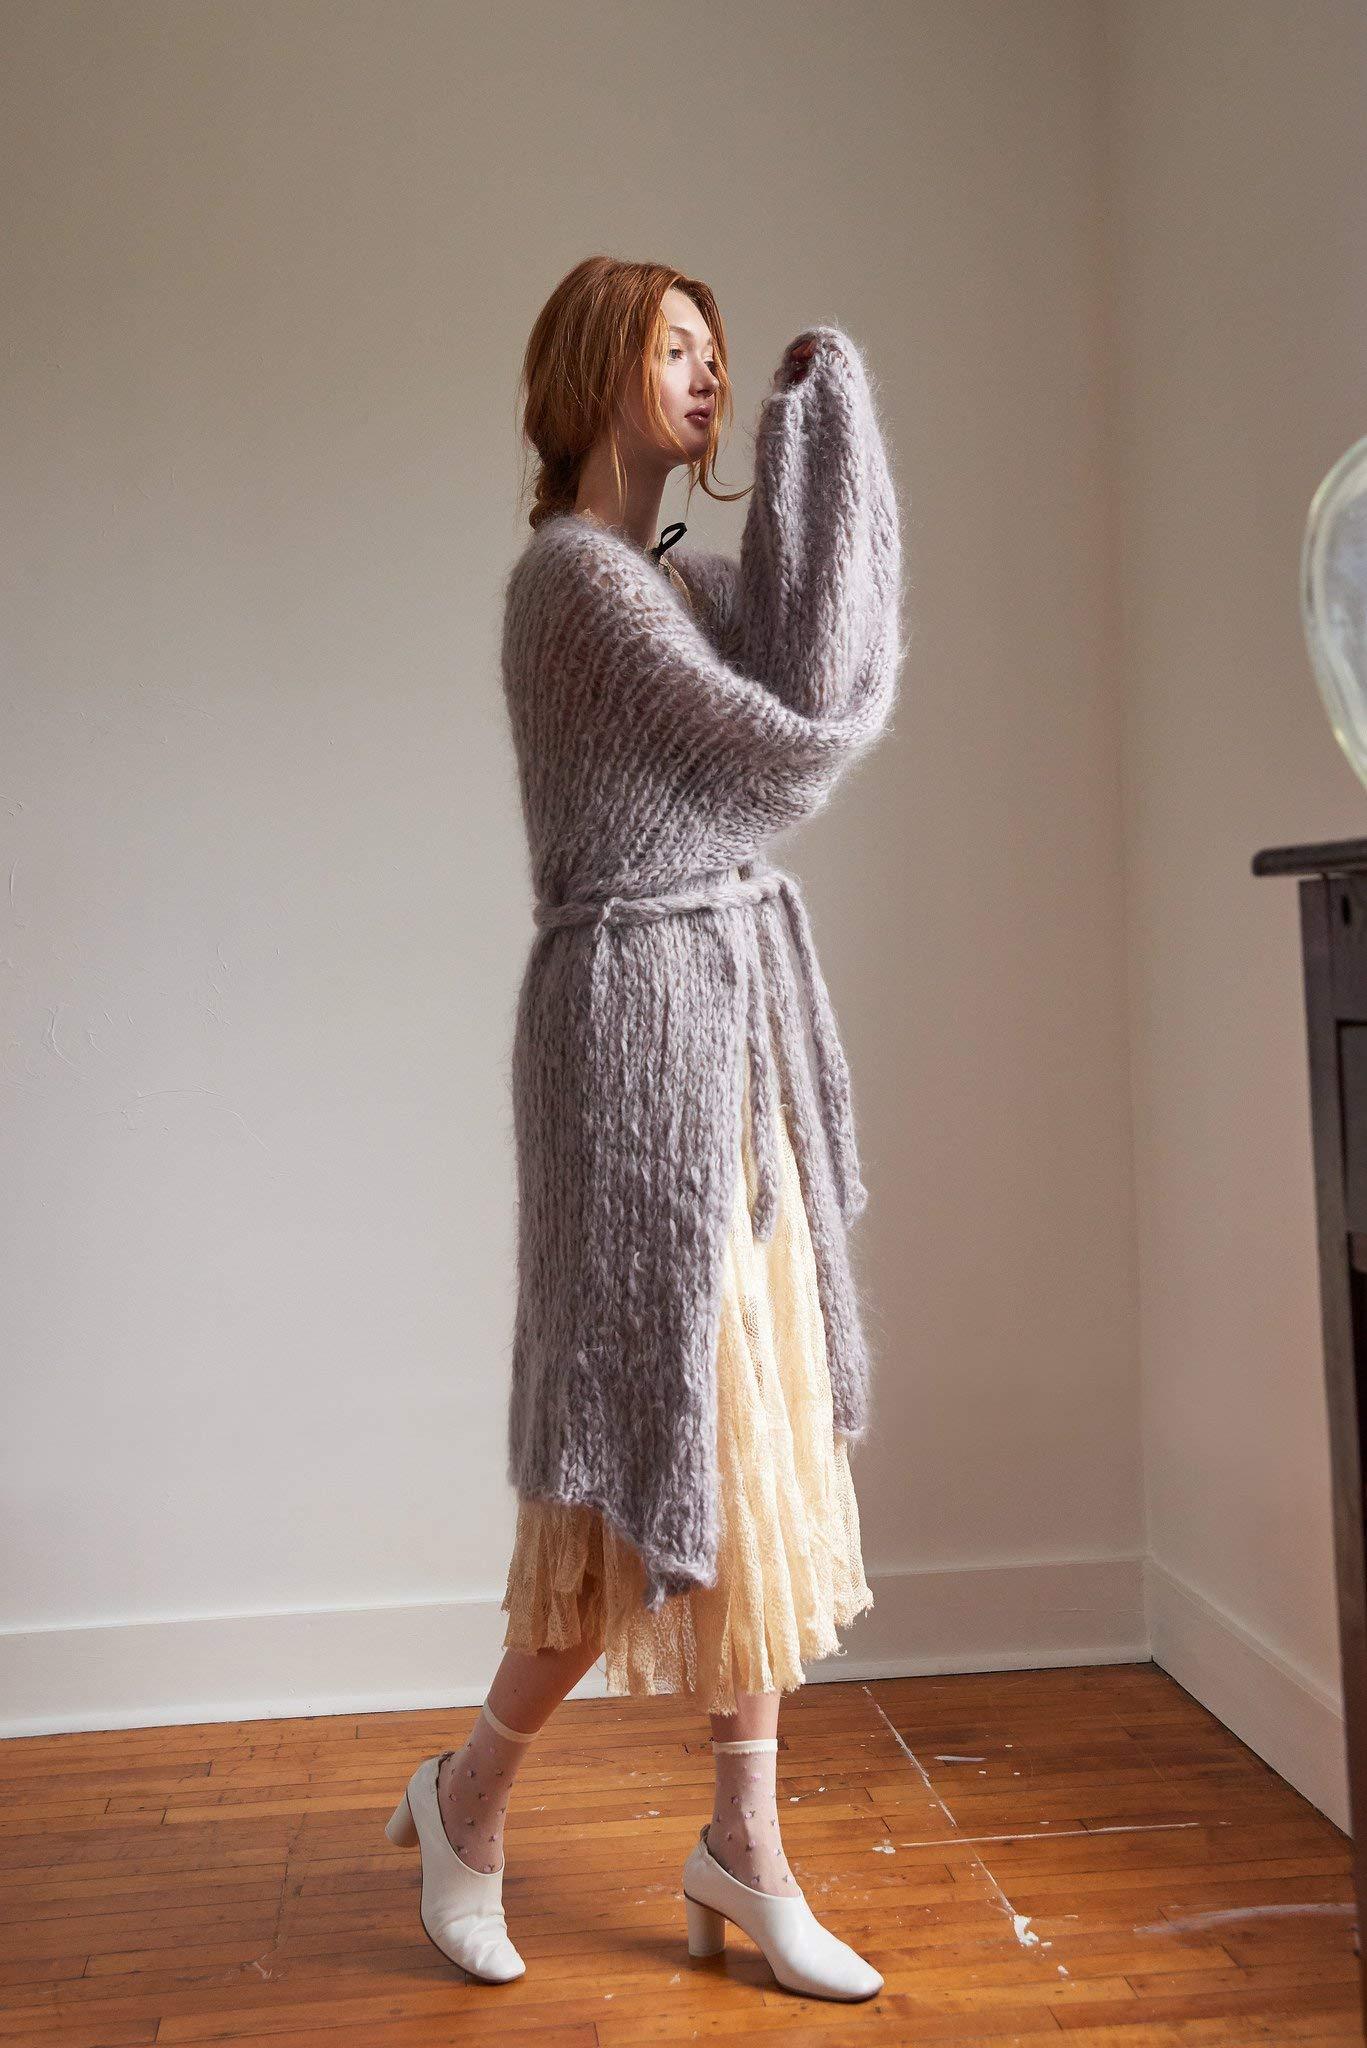 Loopy Mango DIY Knit Kit - Medium/Large Long Cardigan - Mohair So Soft (Moss) by Loopy Mango (Image #3)